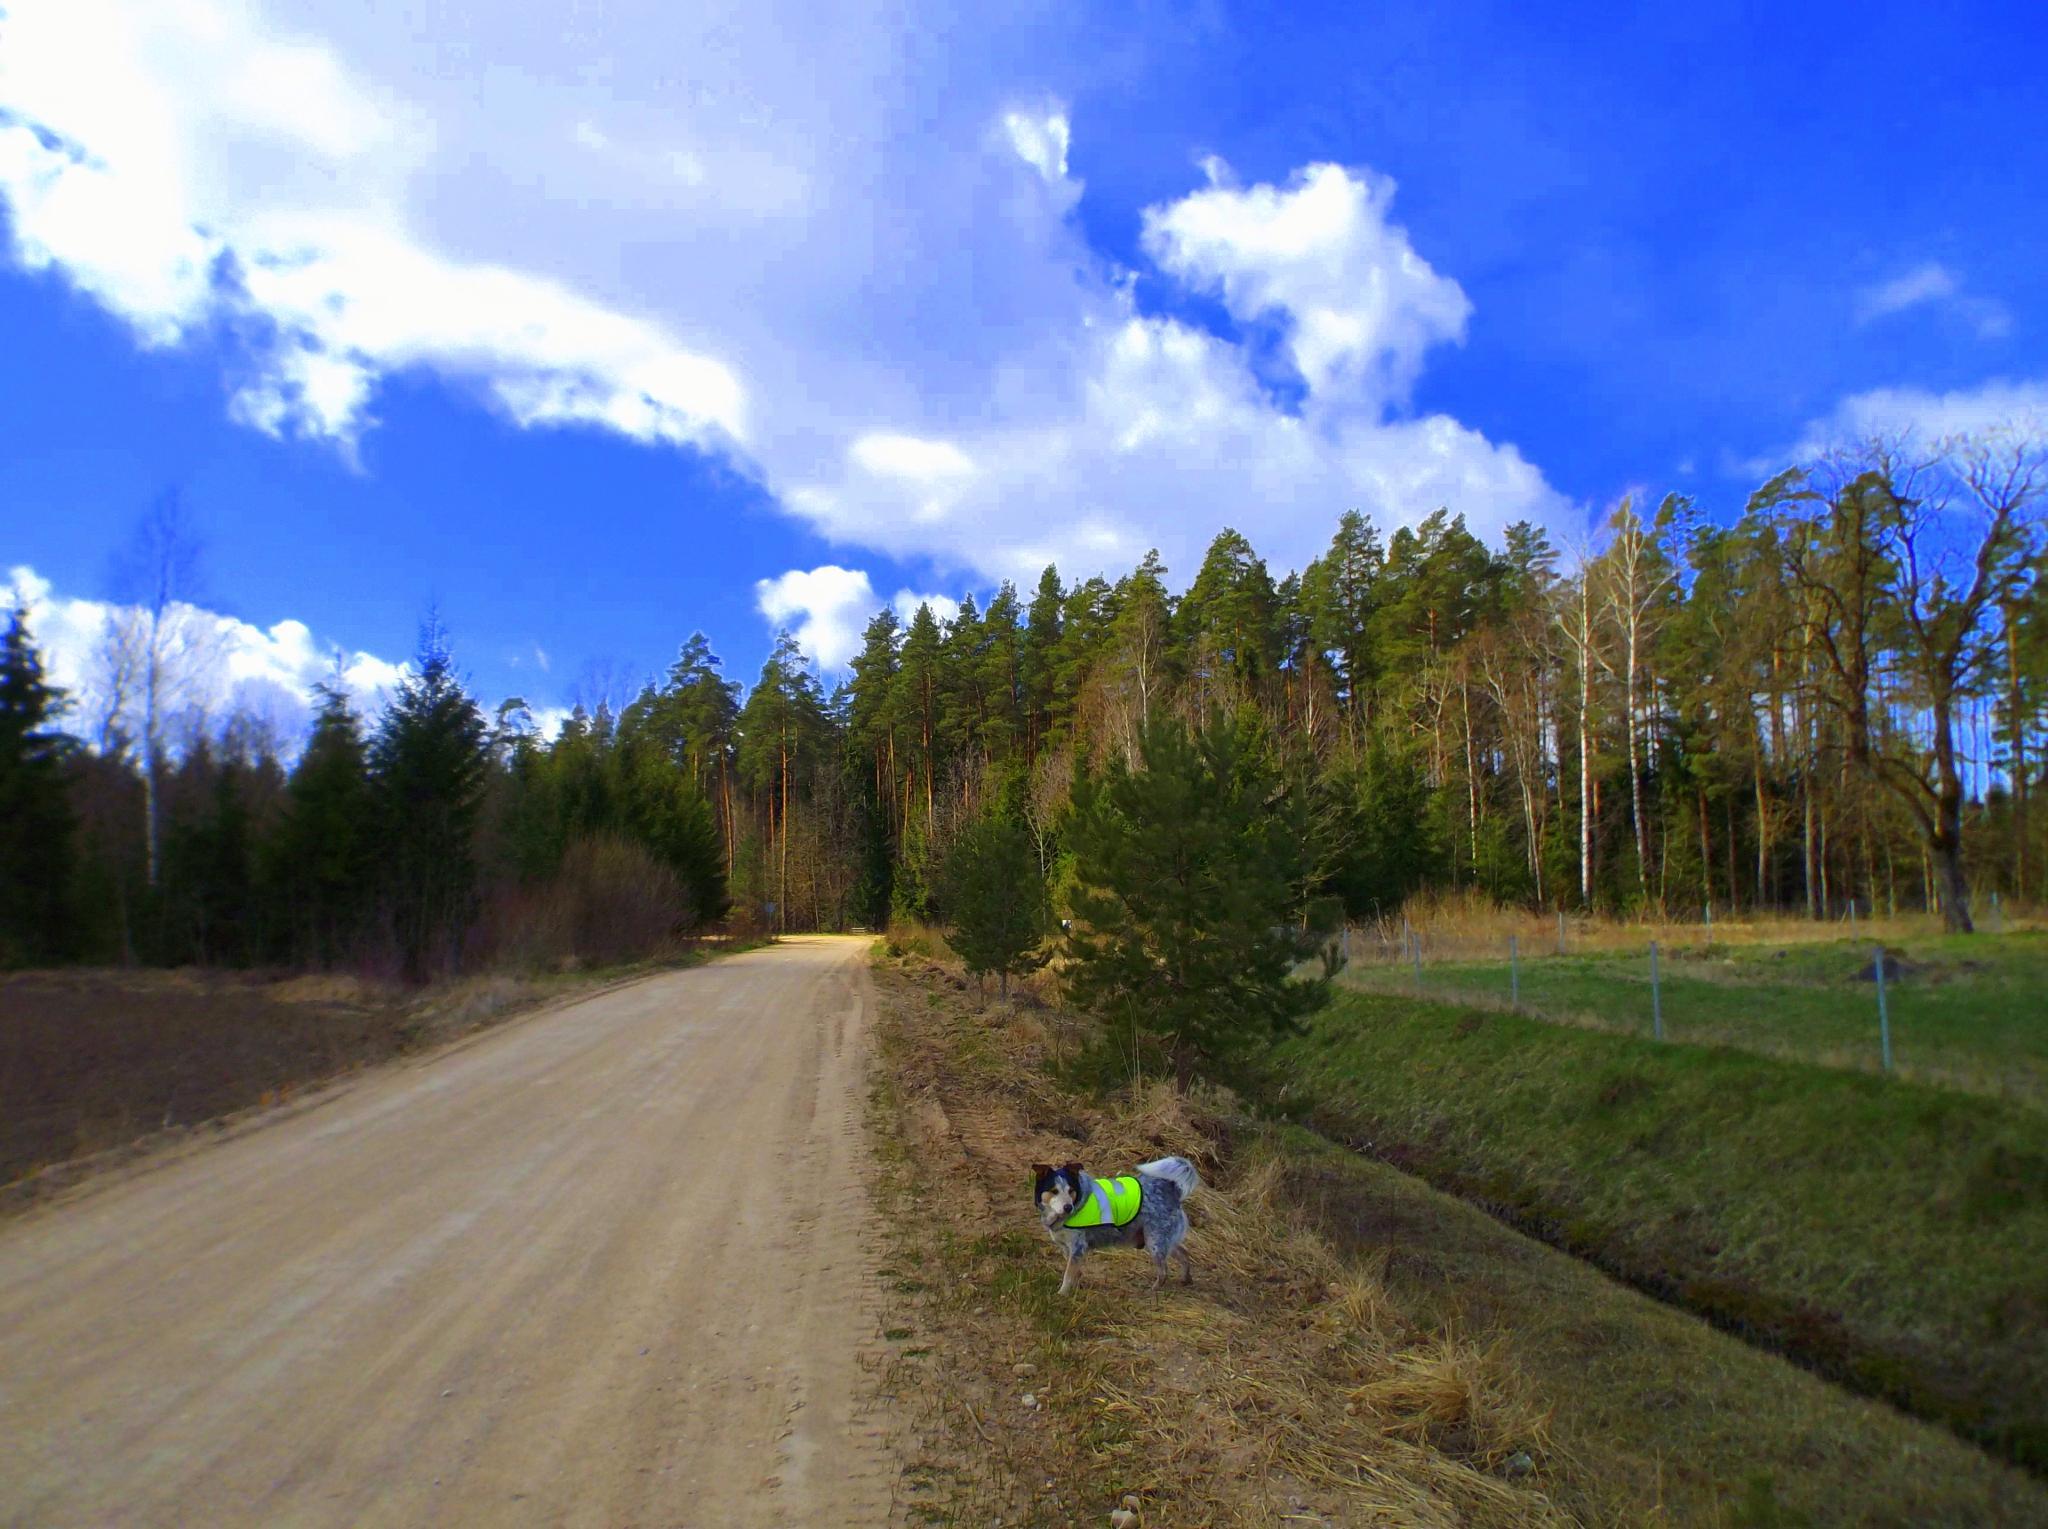 Path in the woods by uzkuraitiene62